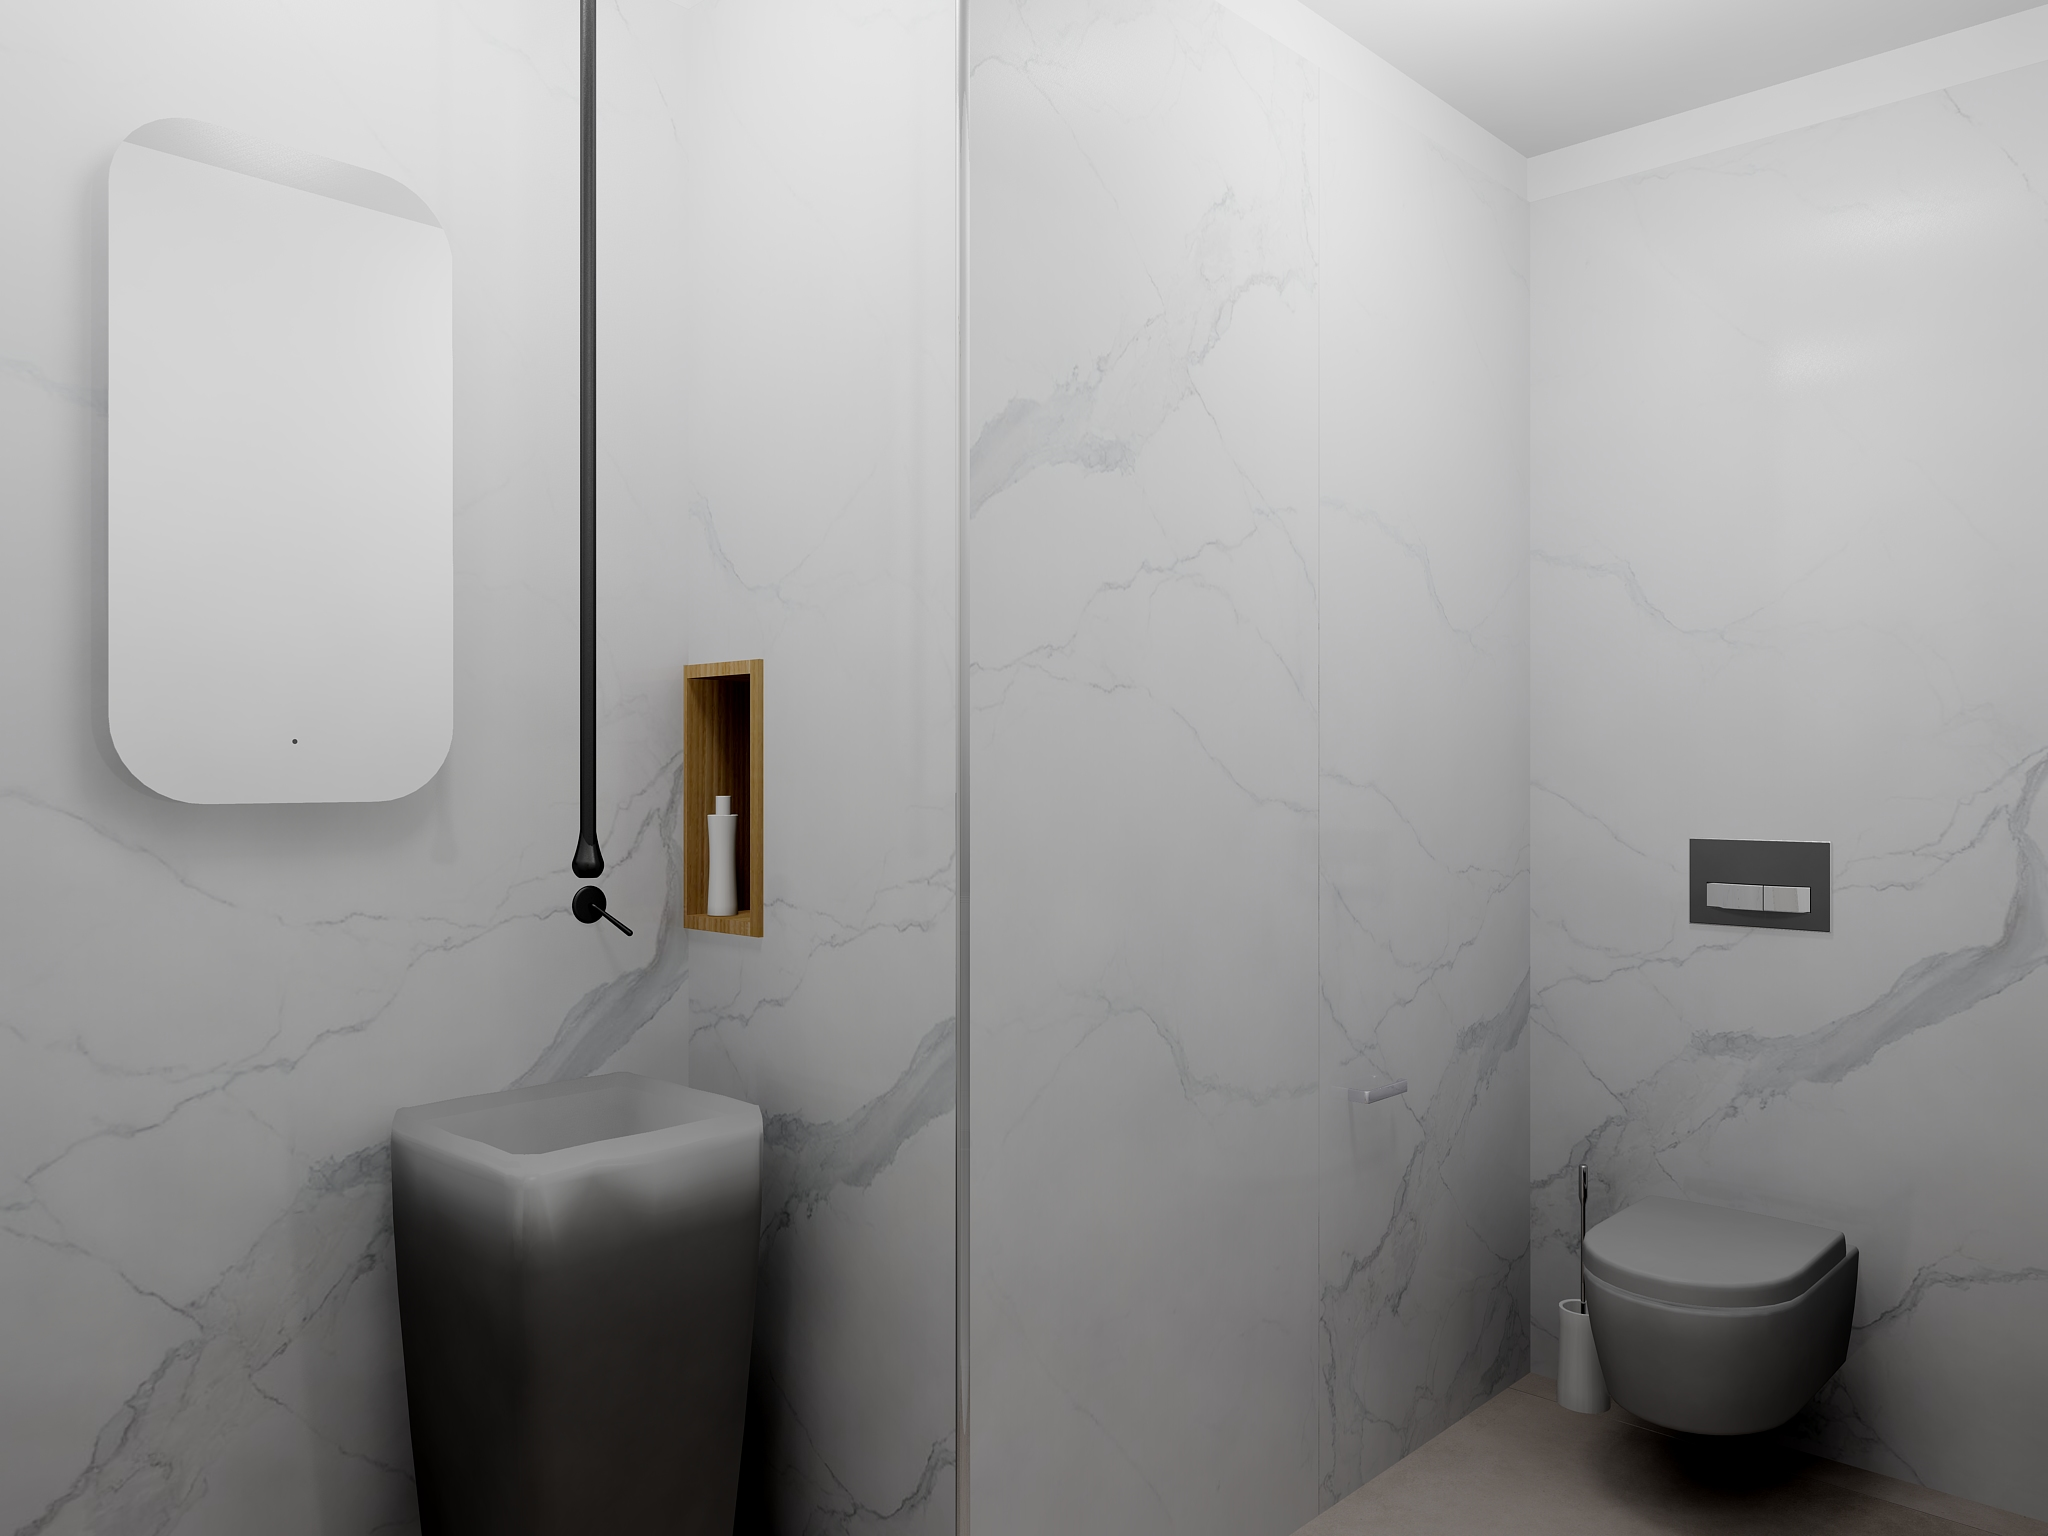 Mattout Carrelage WC INVITES V2 2 Bathroom By Mattout ...